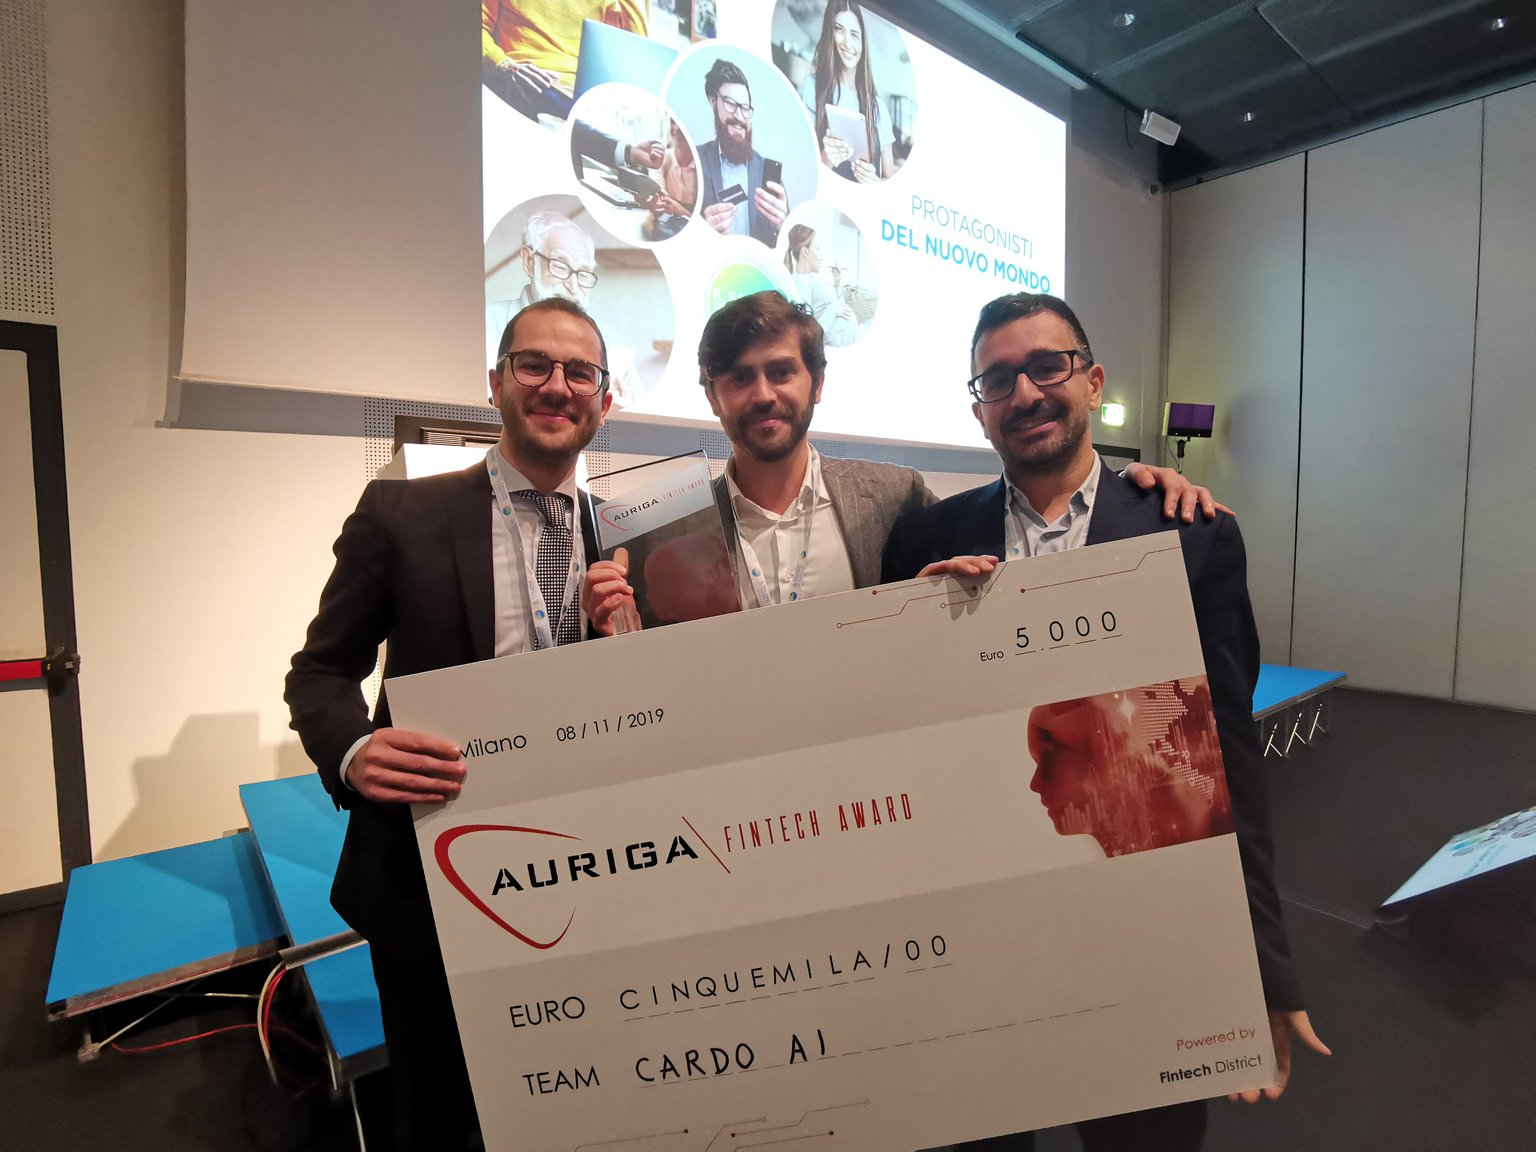 Cardo AI vince l'Auriga Fintech Award. Intelligenza artificiale per l'open innovation